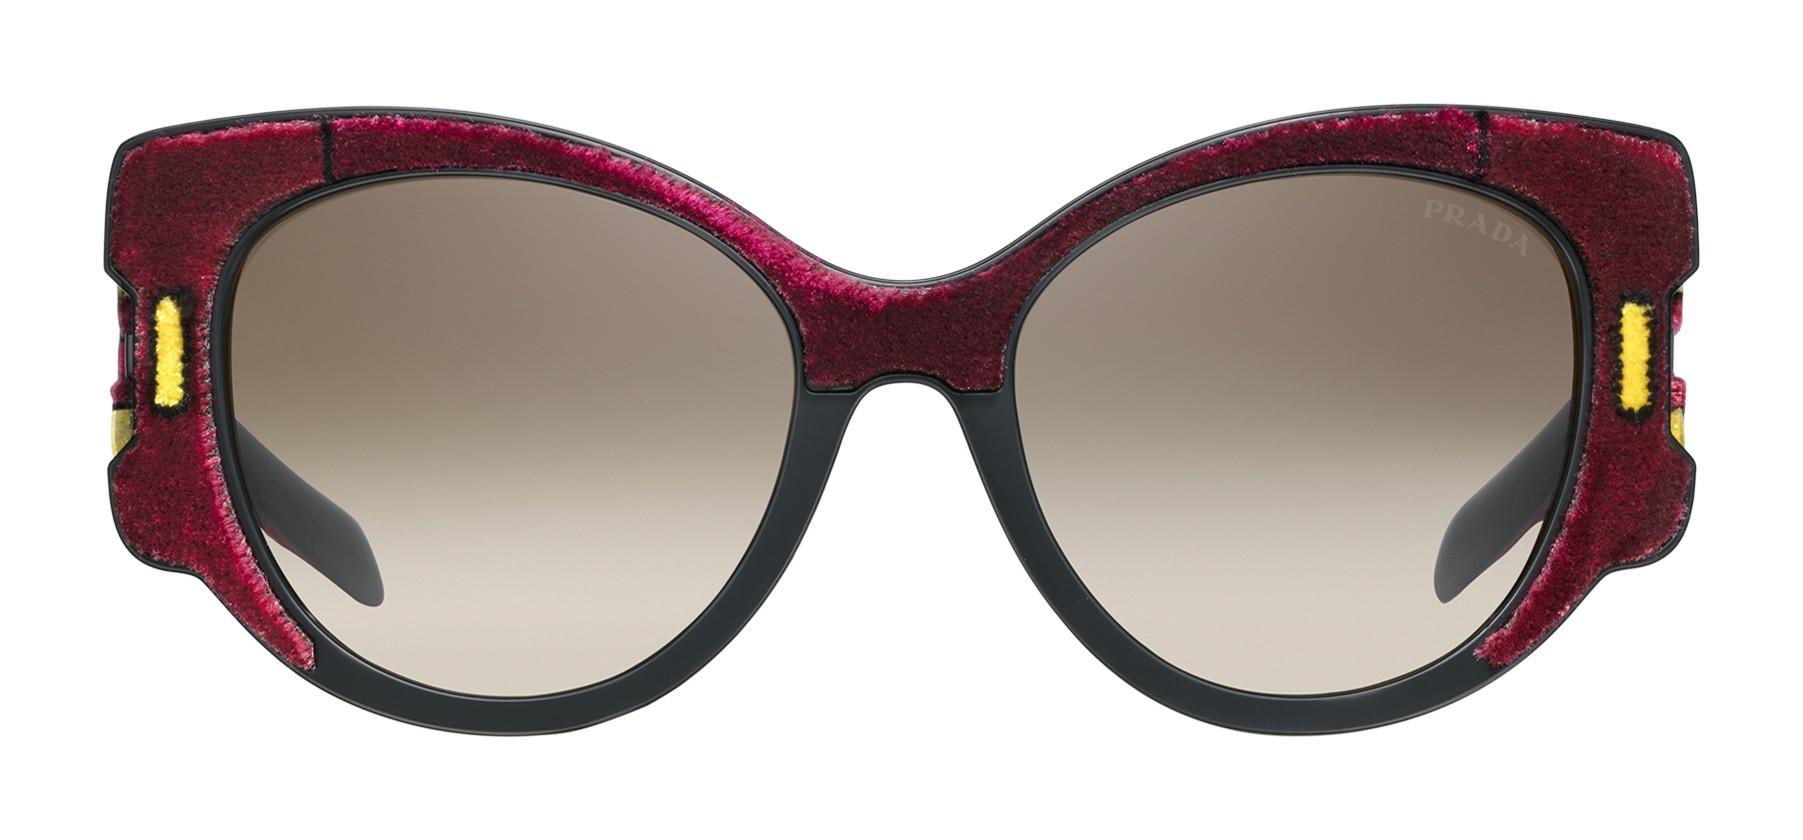 21051cfb0d Prada - Prada Tapestry - Amarena Velvet Cat Eye Sunglasses - Prada Tapestry  Collection - Sunglasses - Prada Eyewear